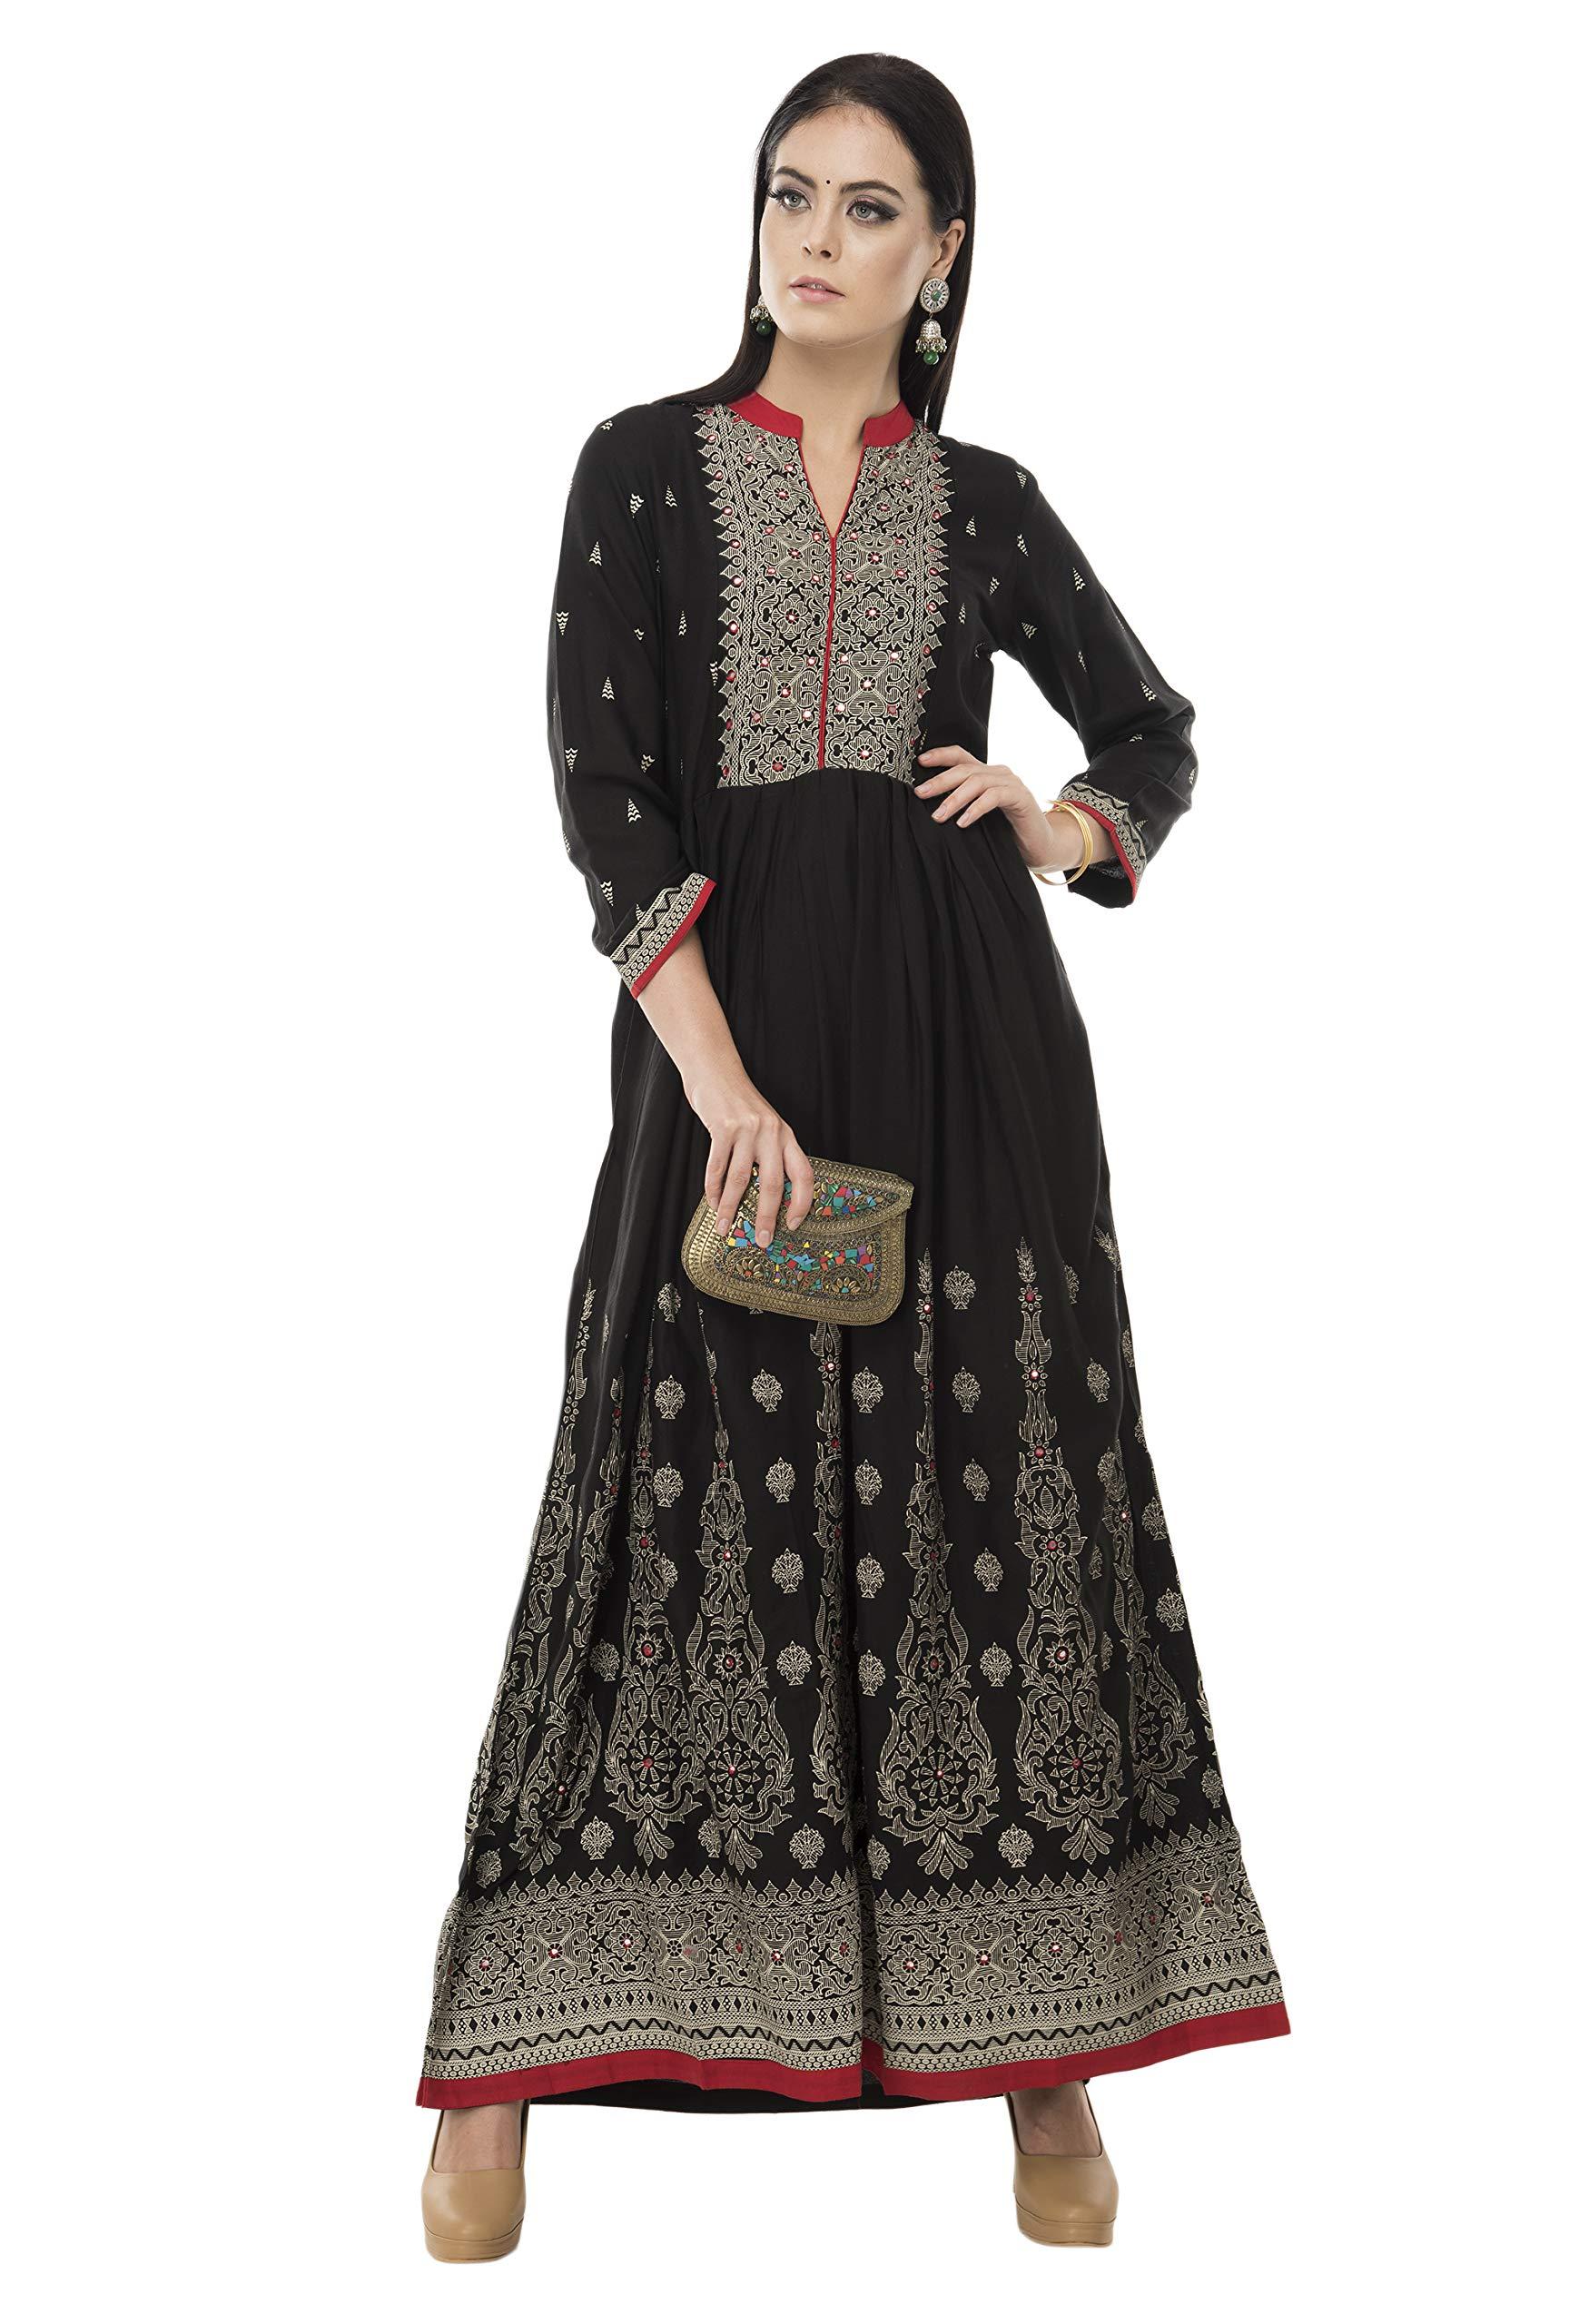 SABHYATA Womens Kurta Indian Kurtis Women Rayon Casual Tunic Top Long Dress Medium Black